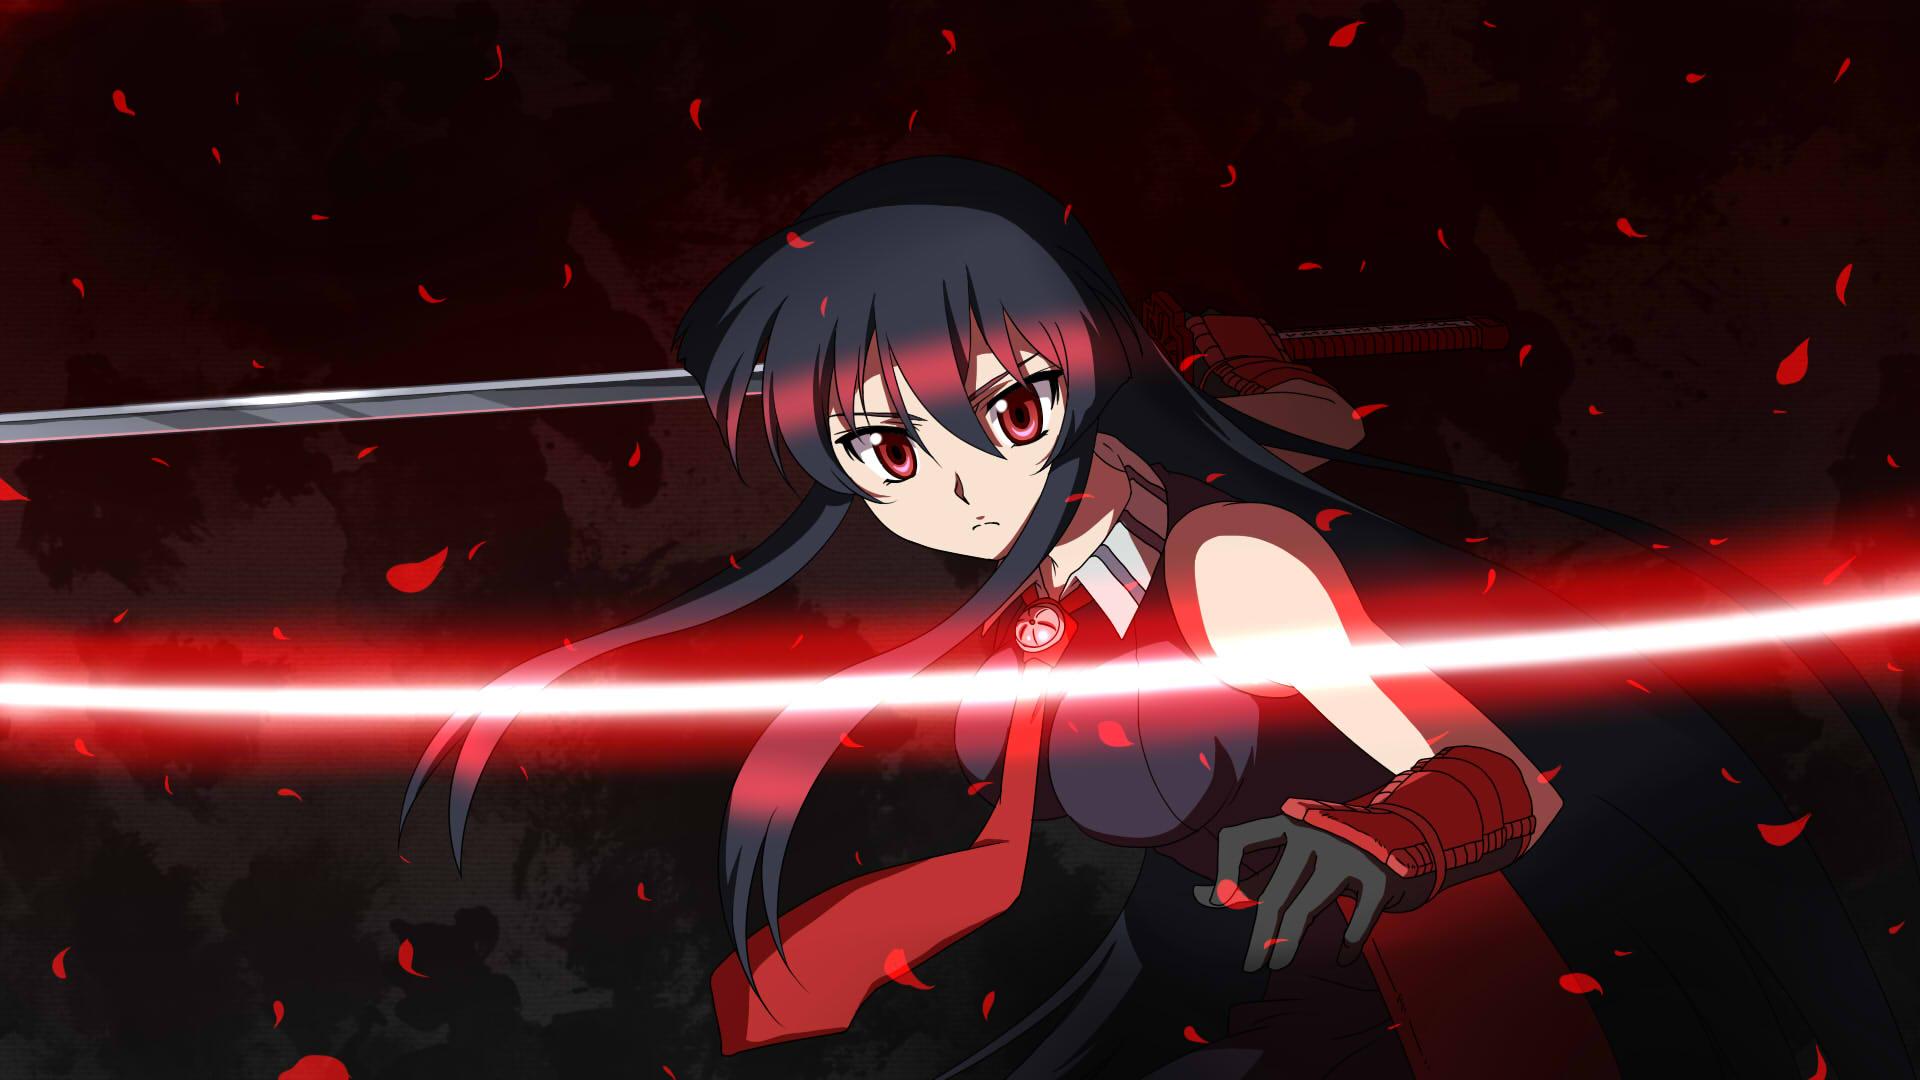 Akame Ga Kill Alpha Coders Wallpaper Abyss Anime Akame Ga Kill